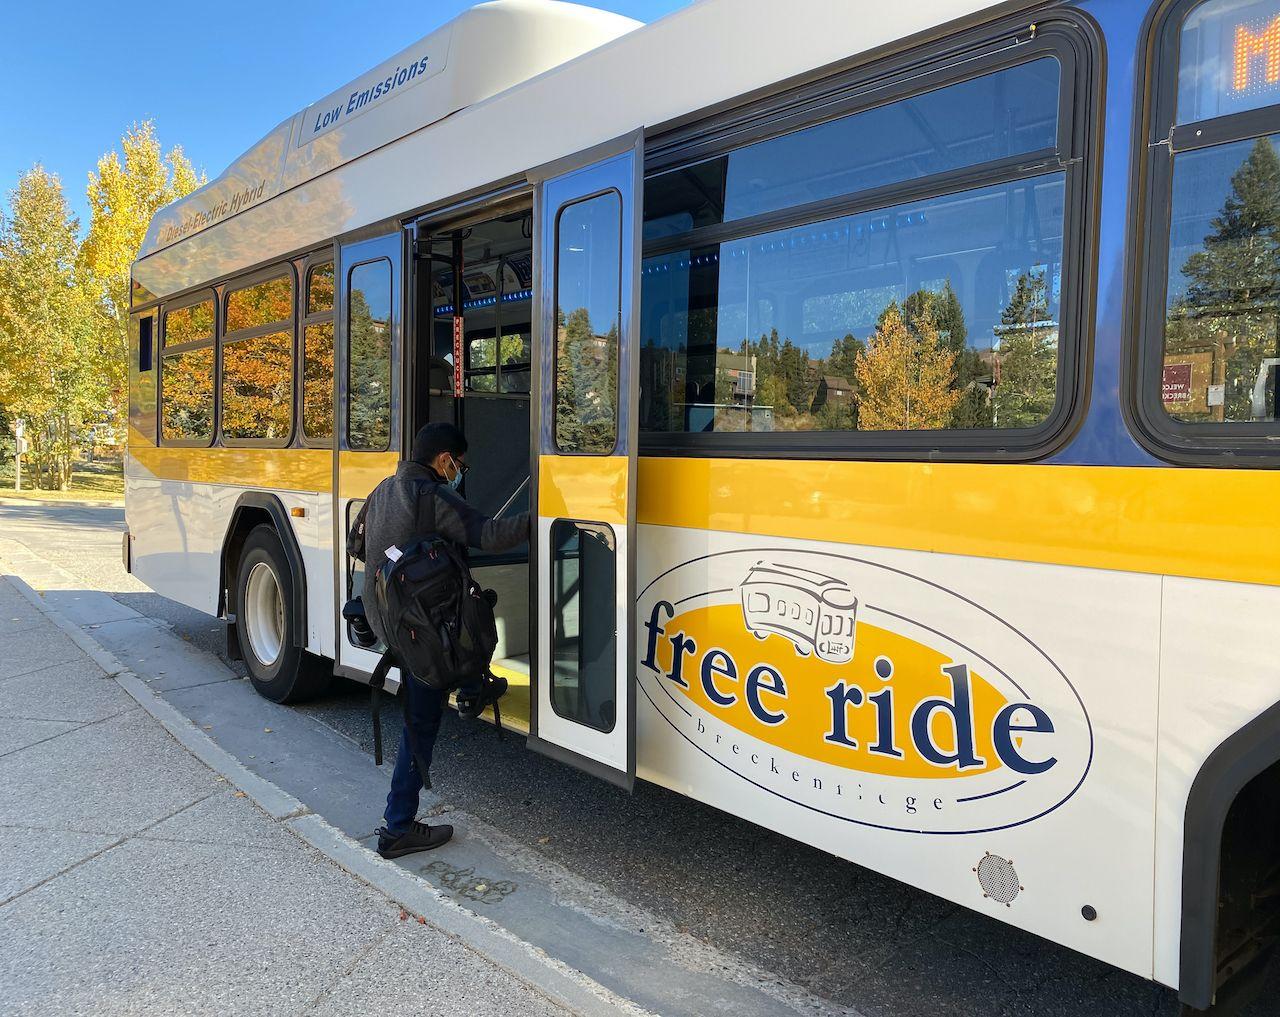 Breckenridge,,Co,/,Usa,-,September,29,,2020:,Passenger,Getting, sustainable travel in Breckenridge